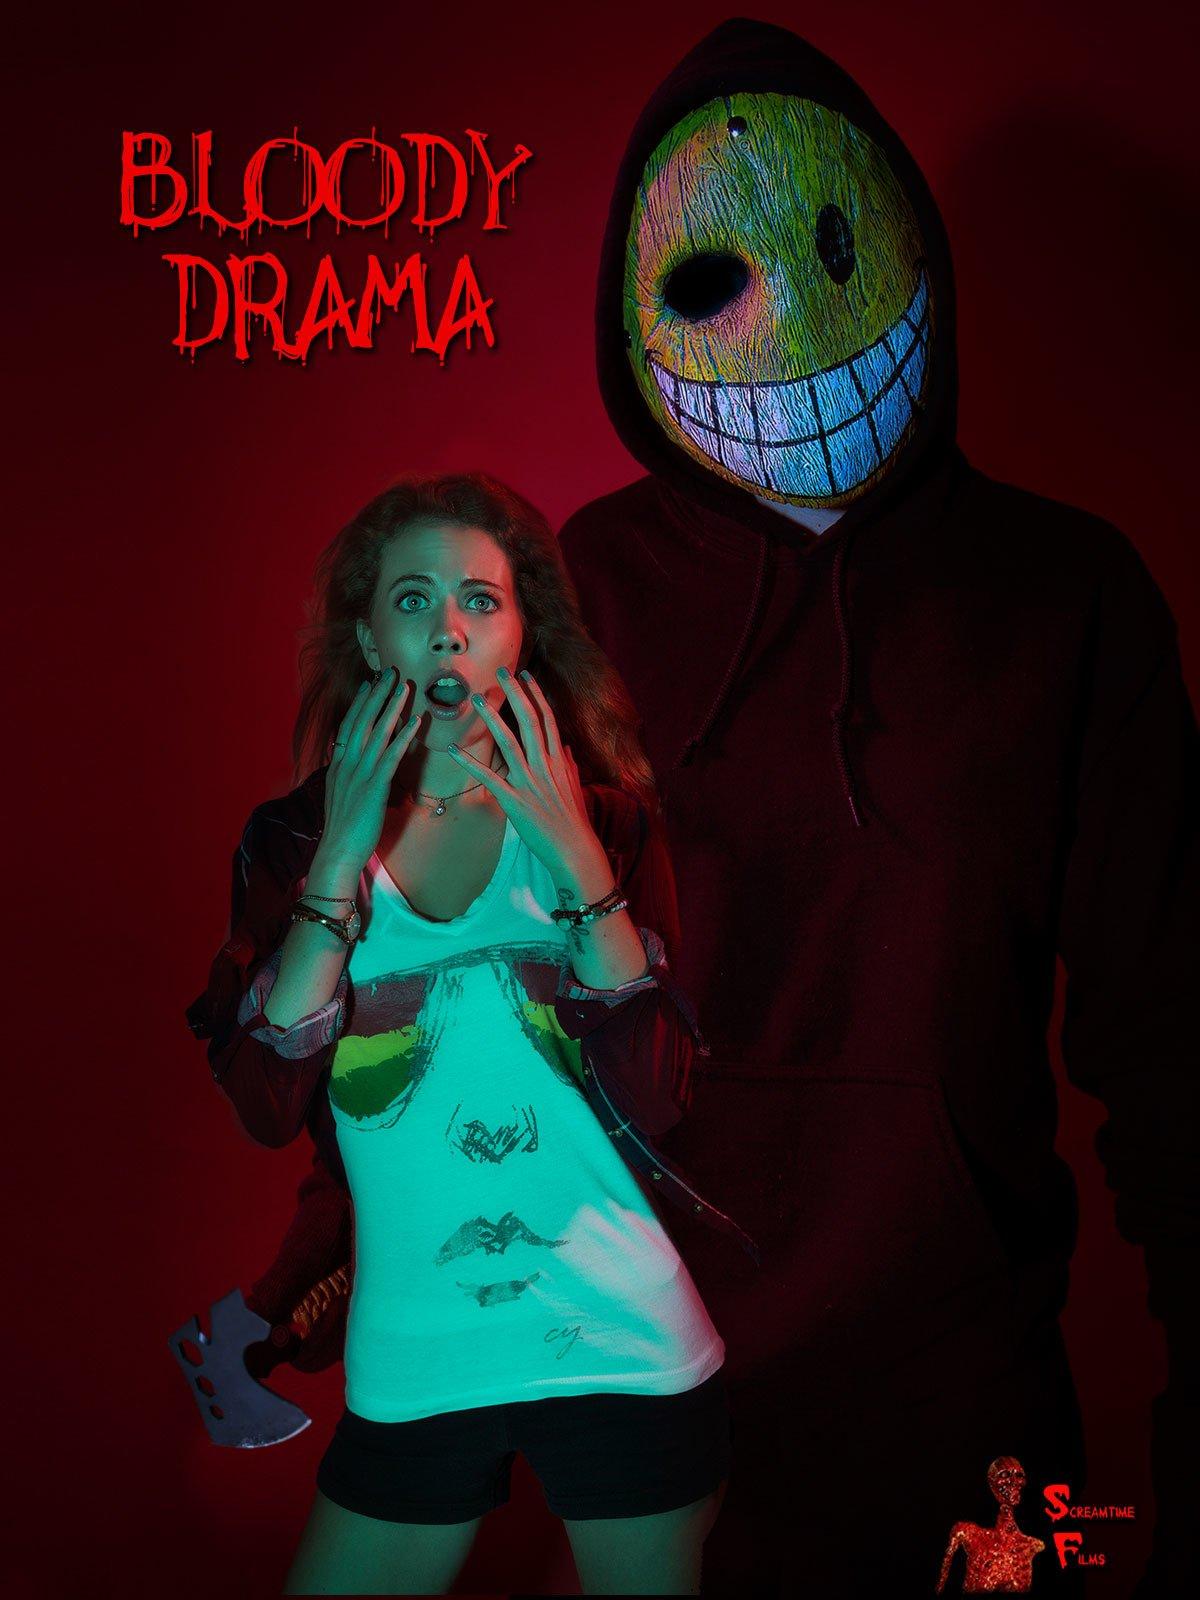 Bloody Drama